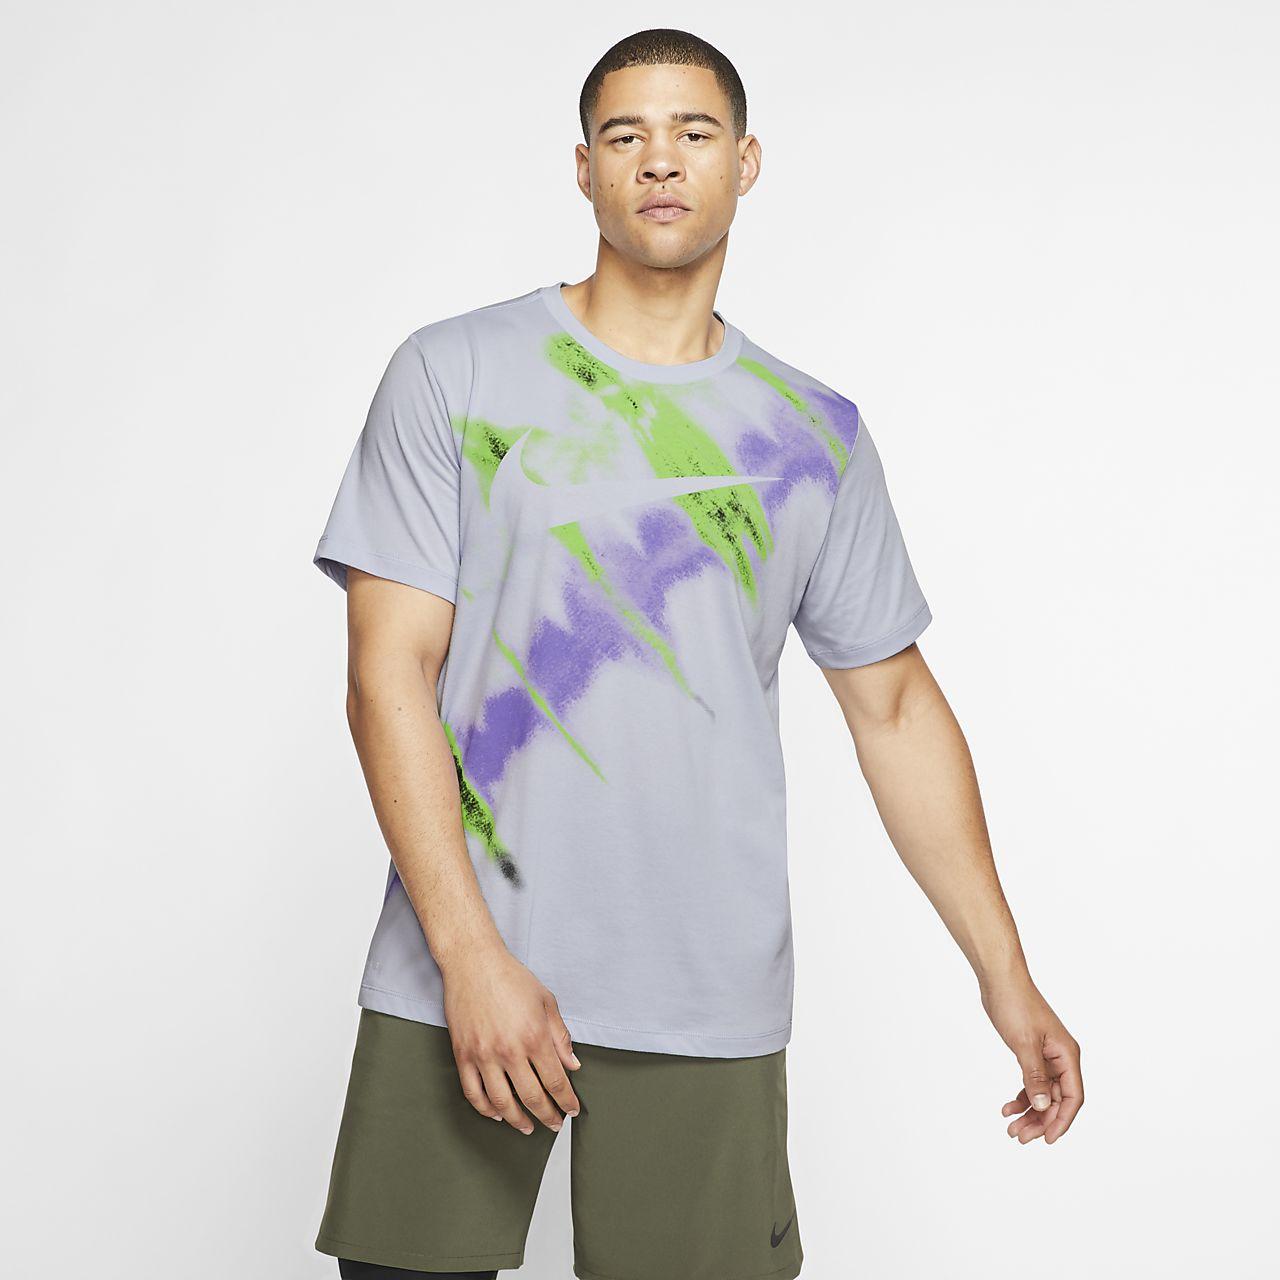 Nike Dri-FIT Kısa Kollu Erkek Antrenman Tişörtü